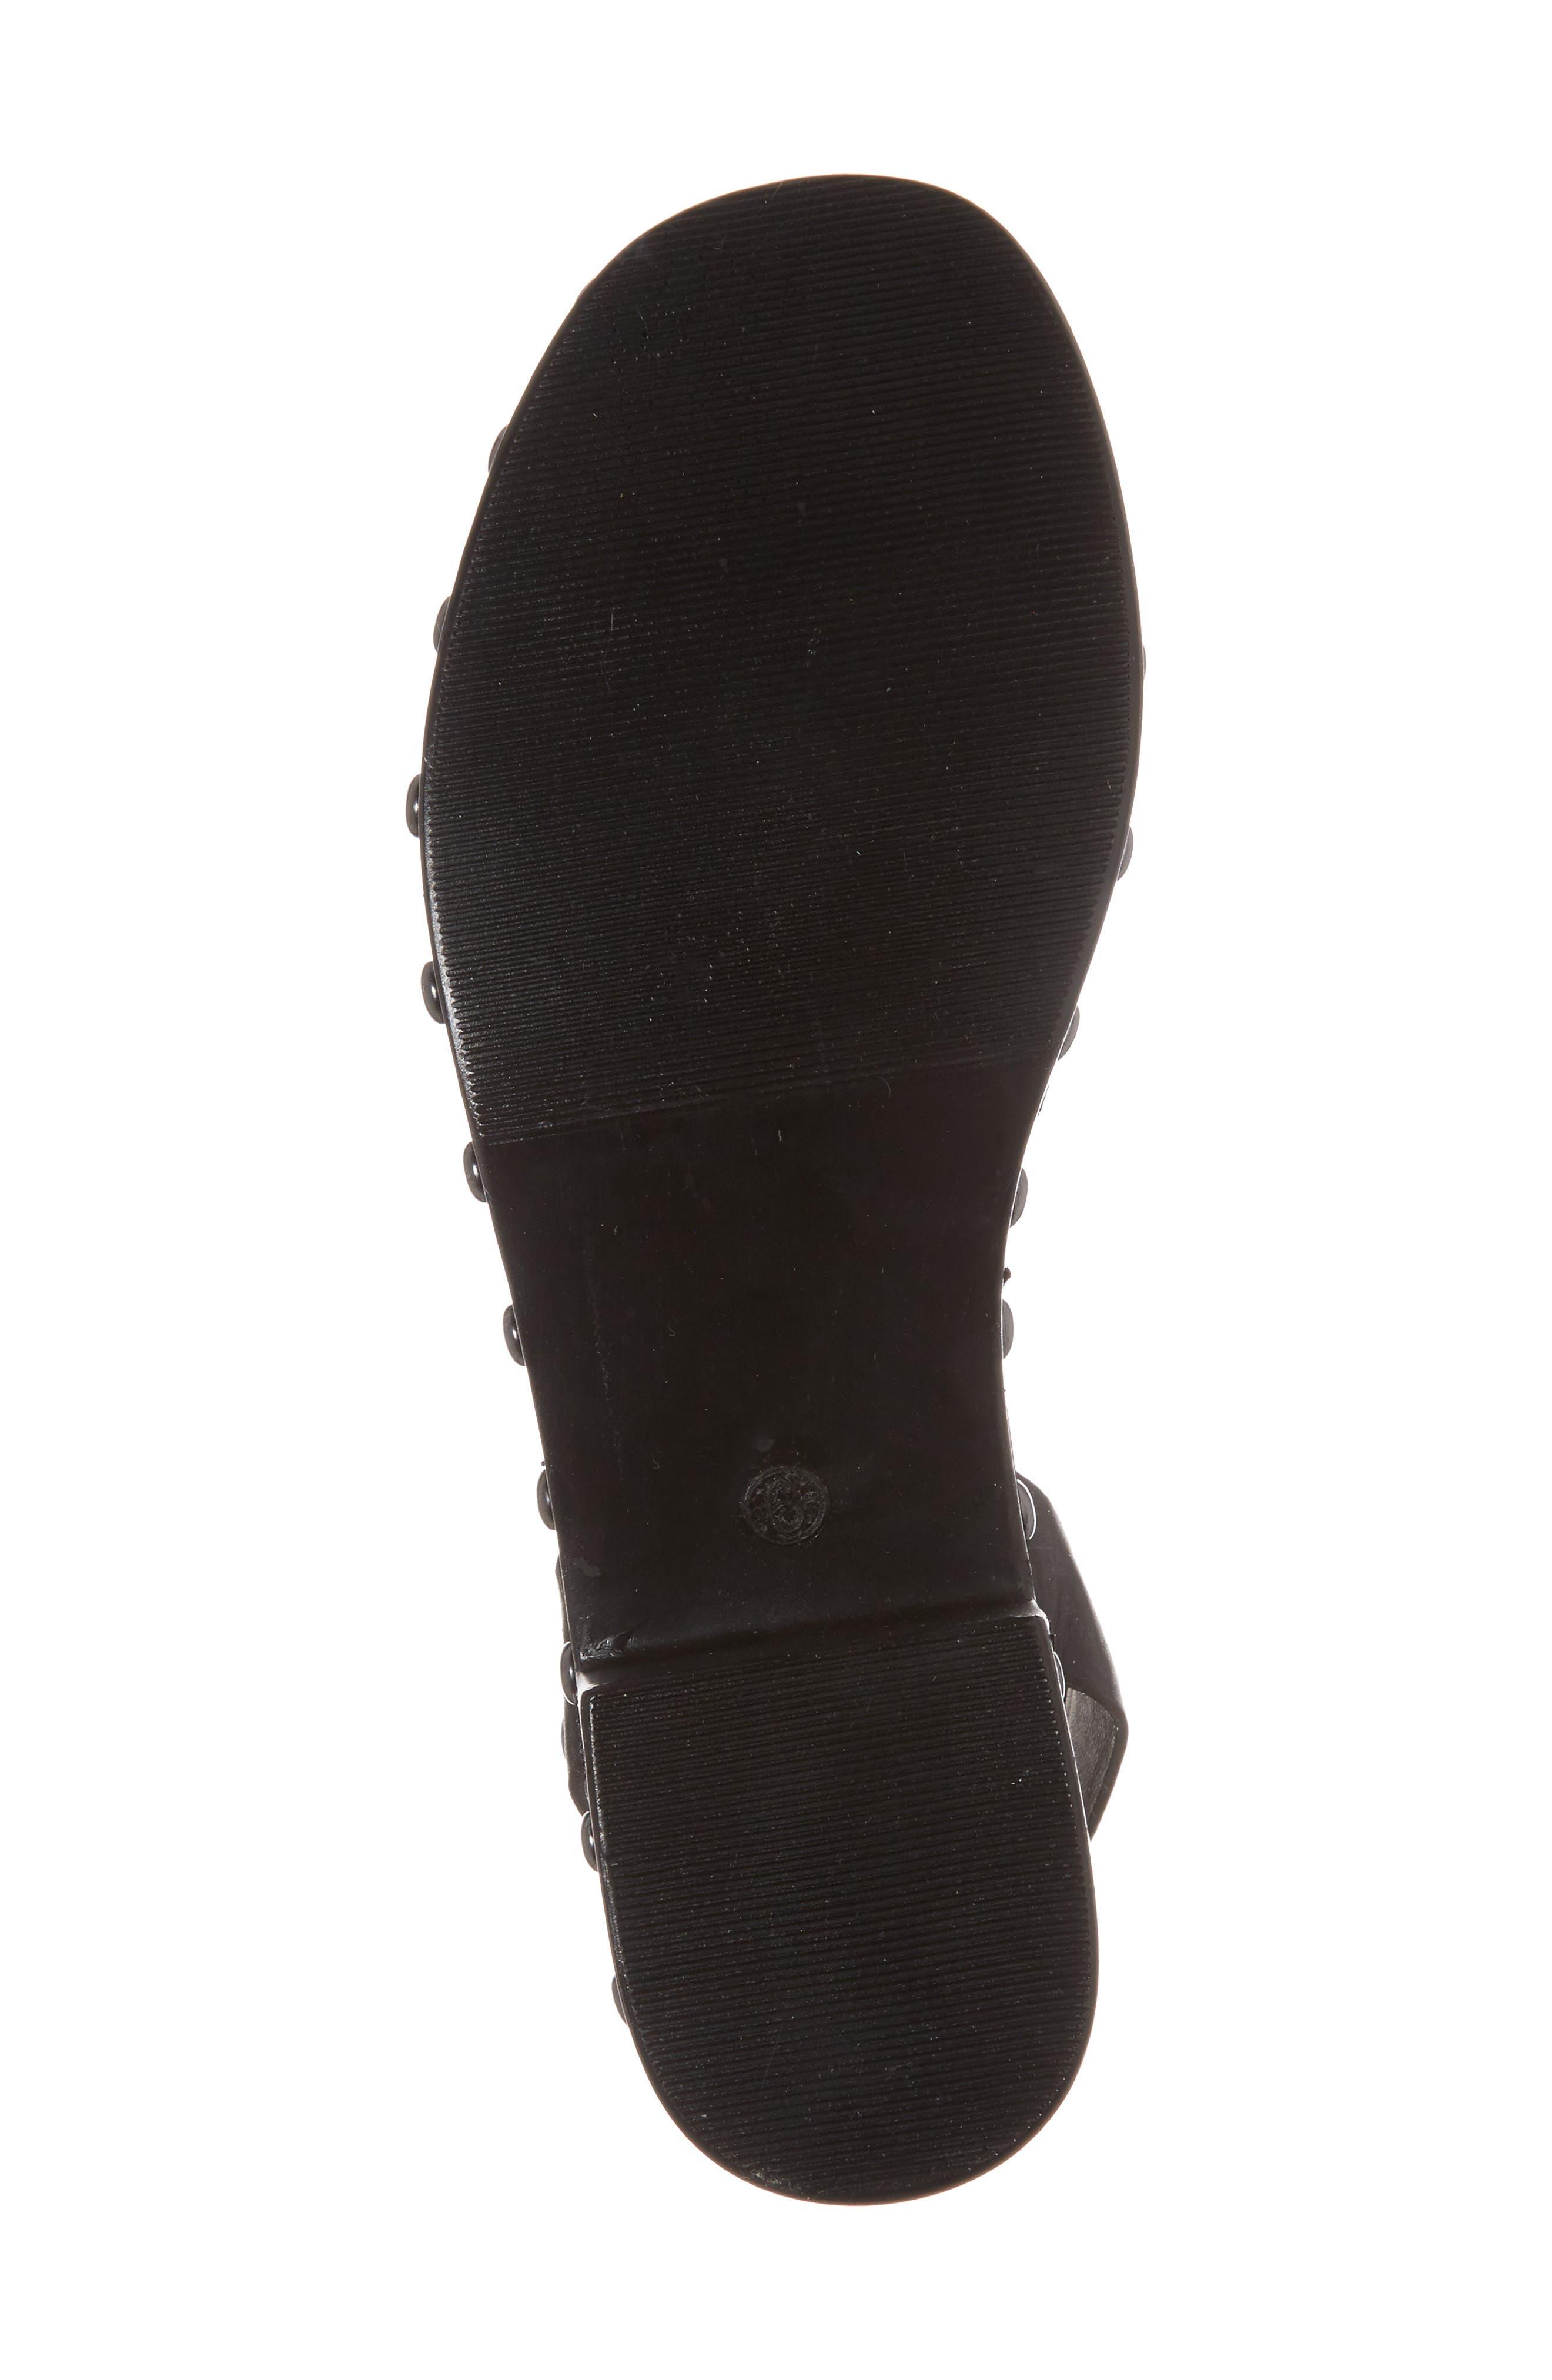 Spare Moments Sandal,                             Alternate thumbnail 6, color,                             Black Leather